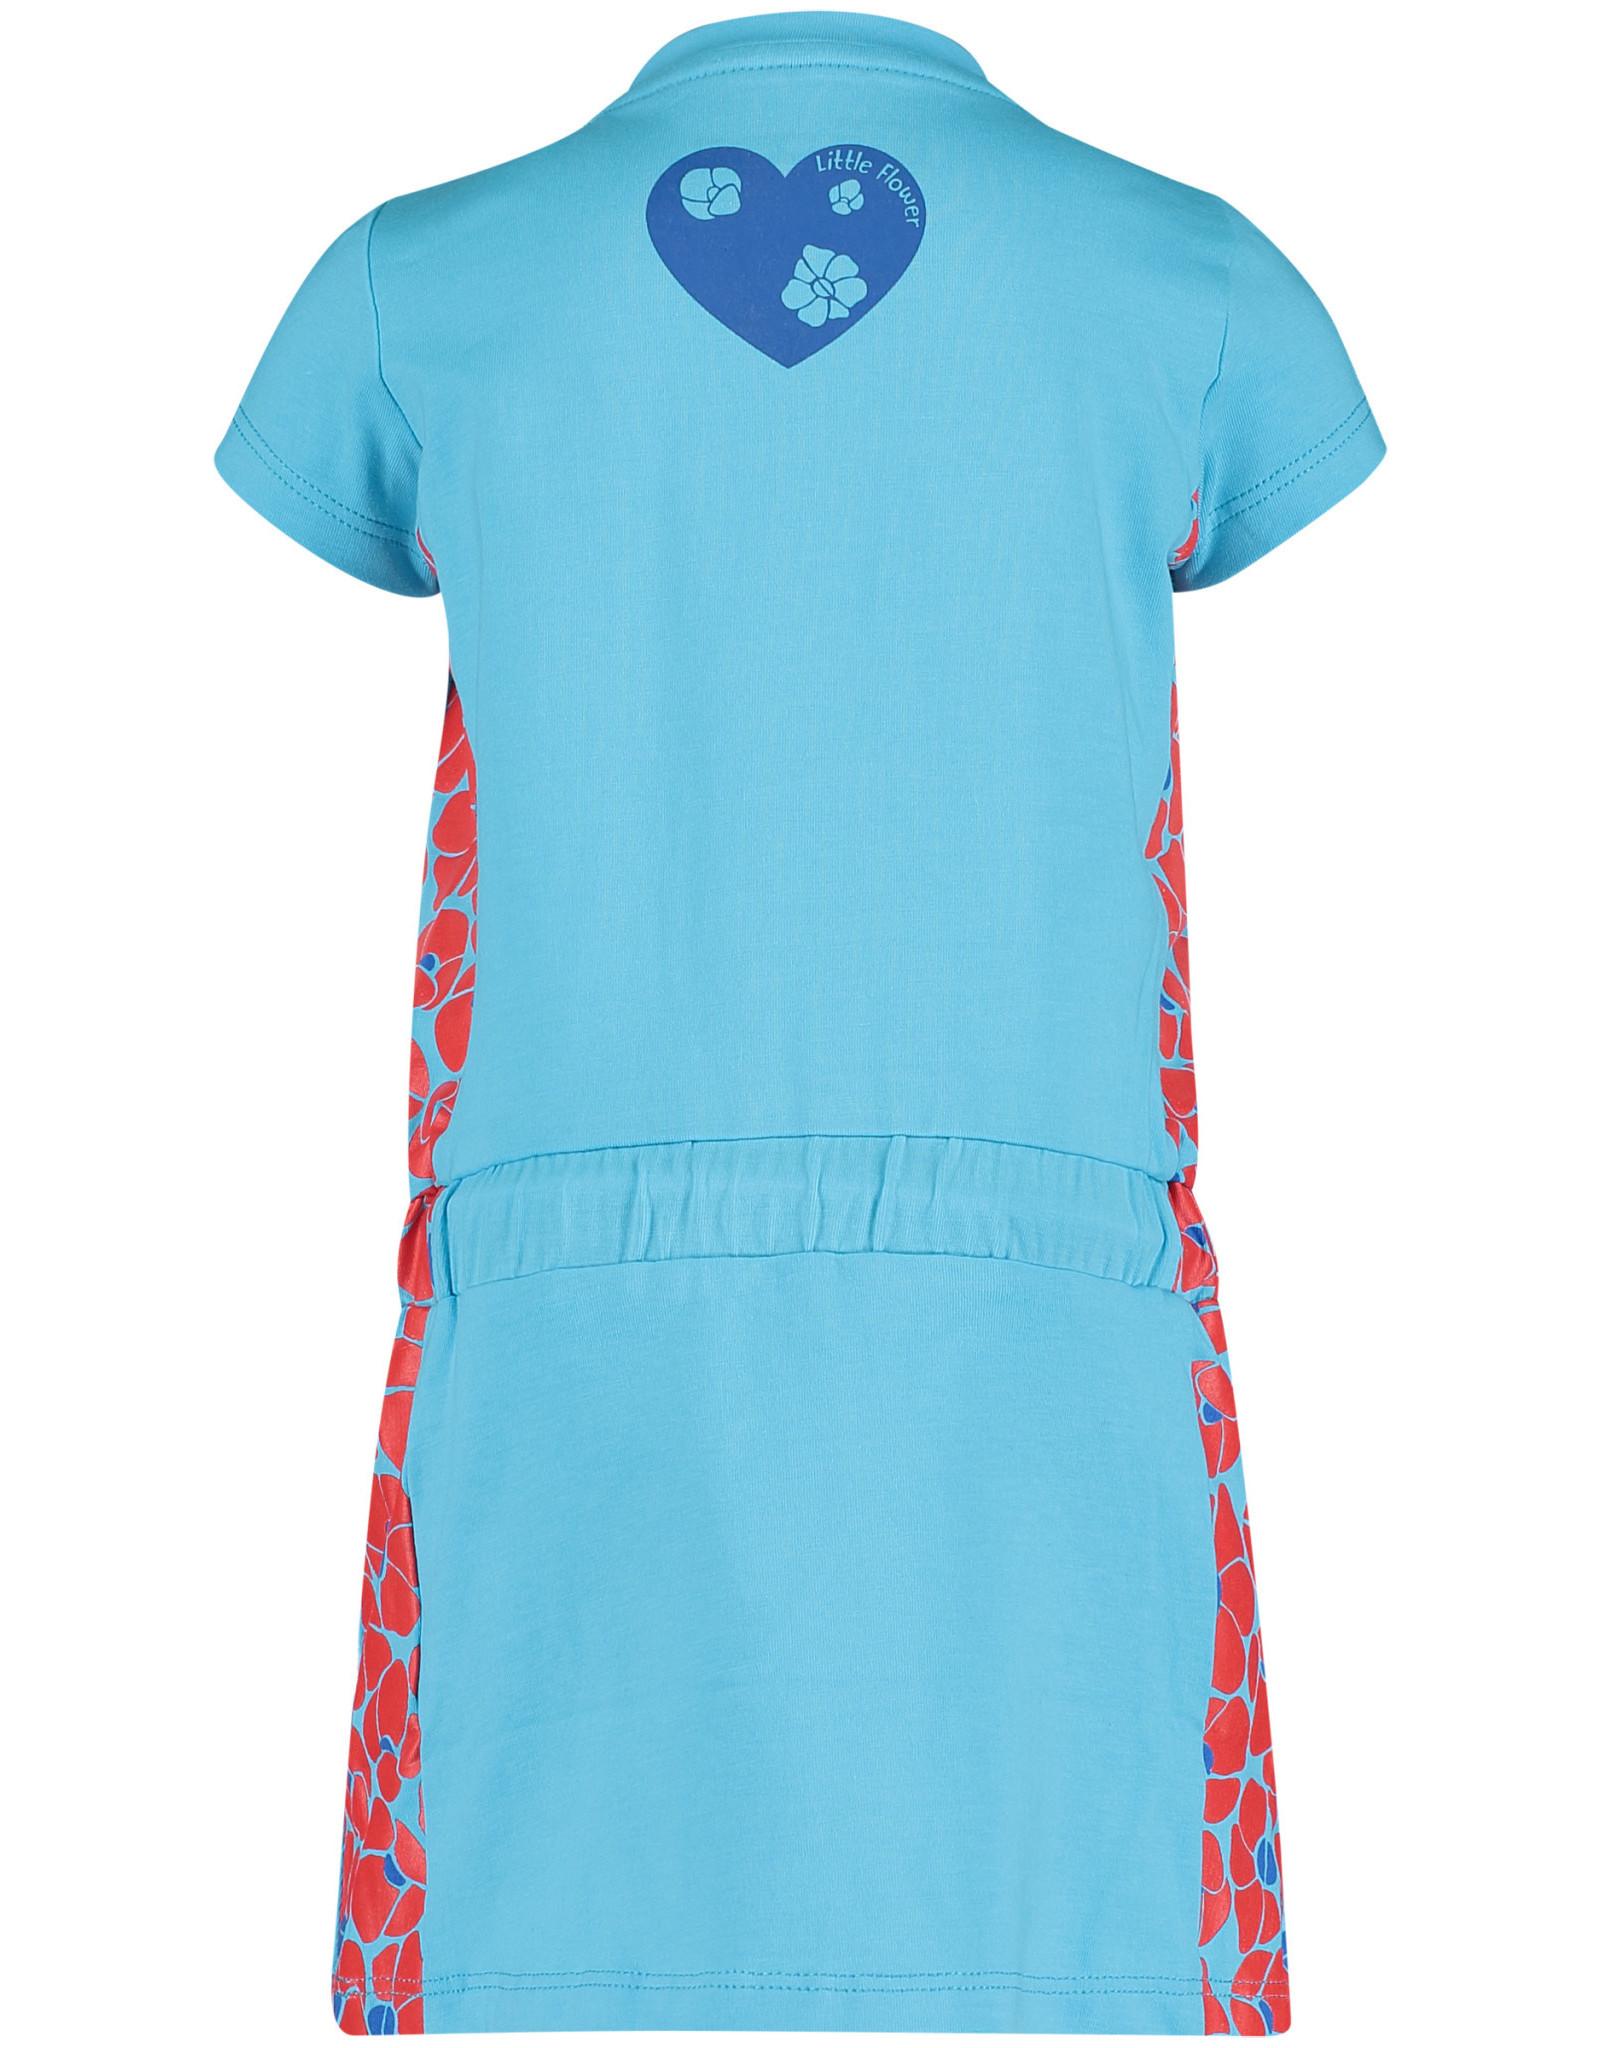 4President 4President meisjes korte mouwen jurk Tana Turquoise